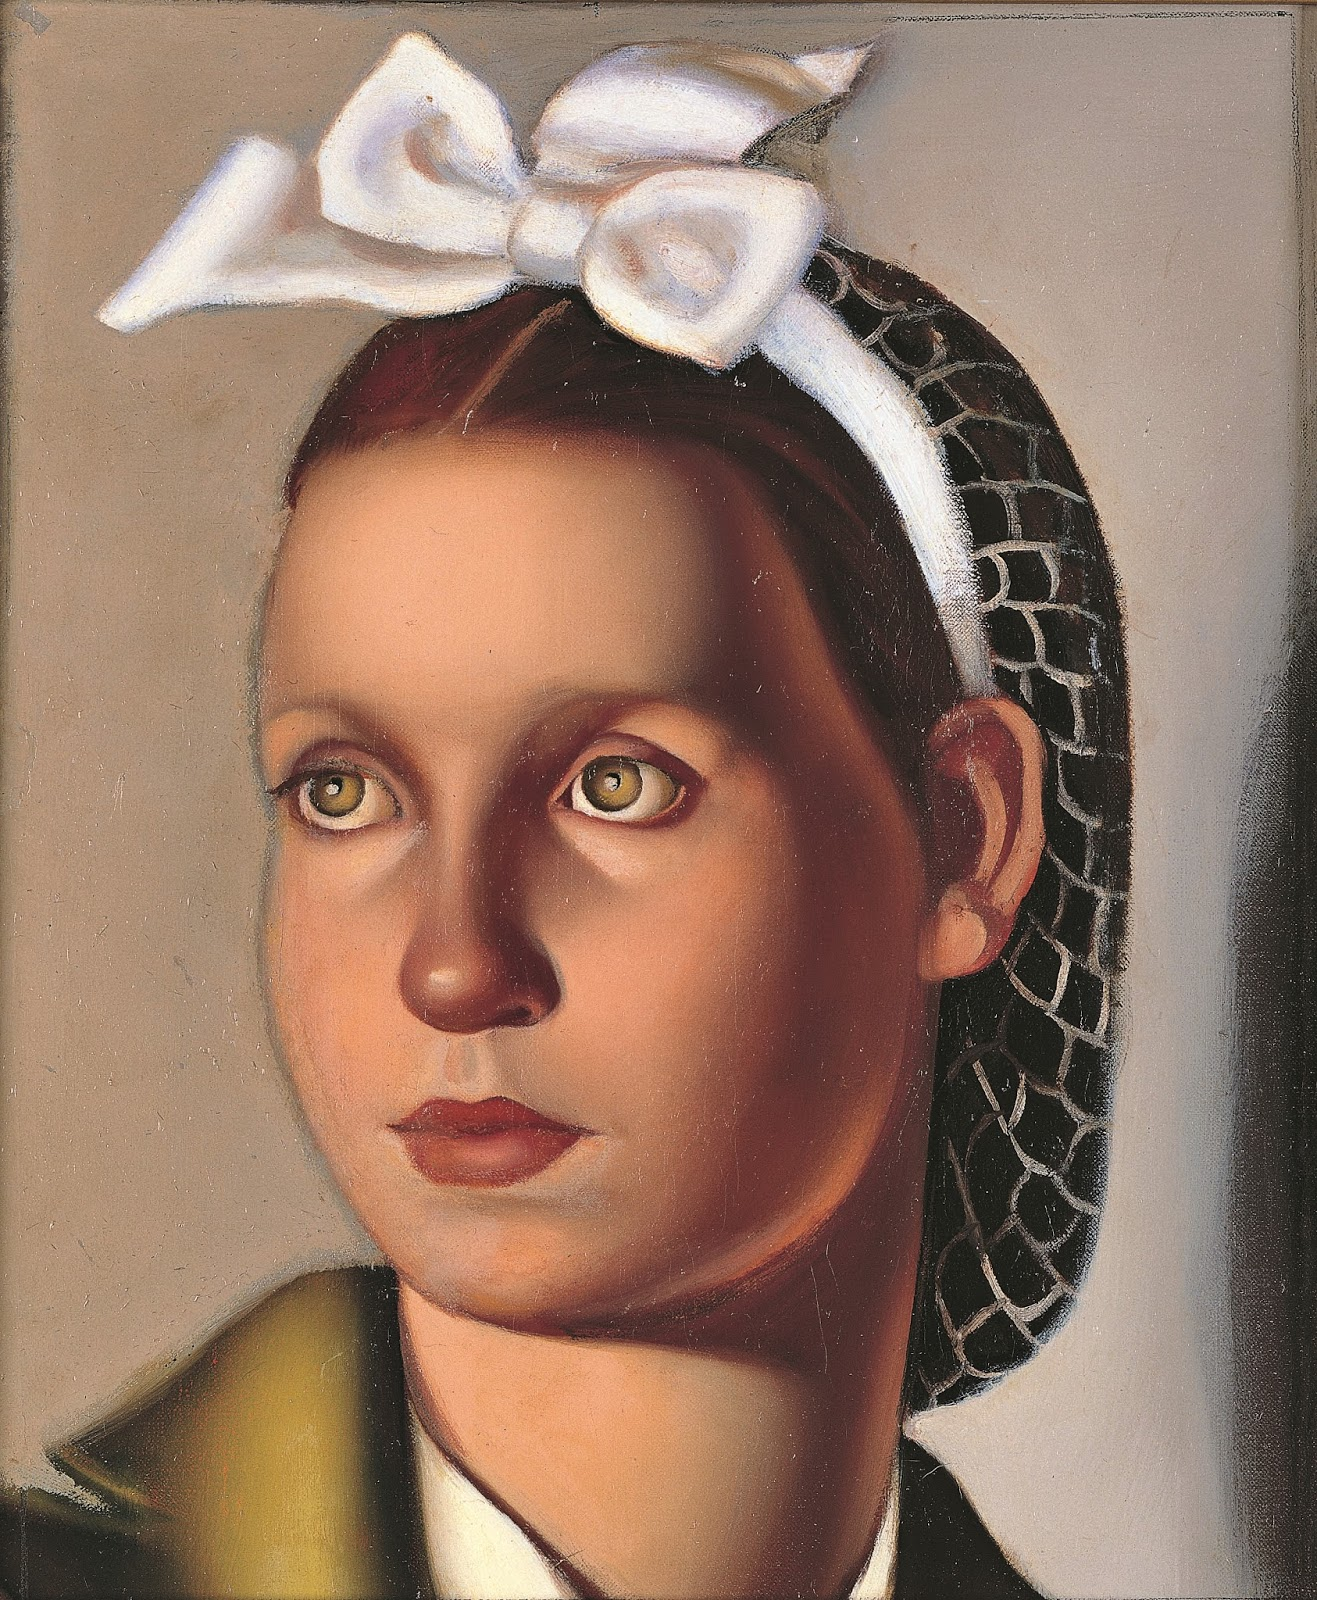 Tamara  De  Lempicka  Portrait  de  Louisianne  Kuffner